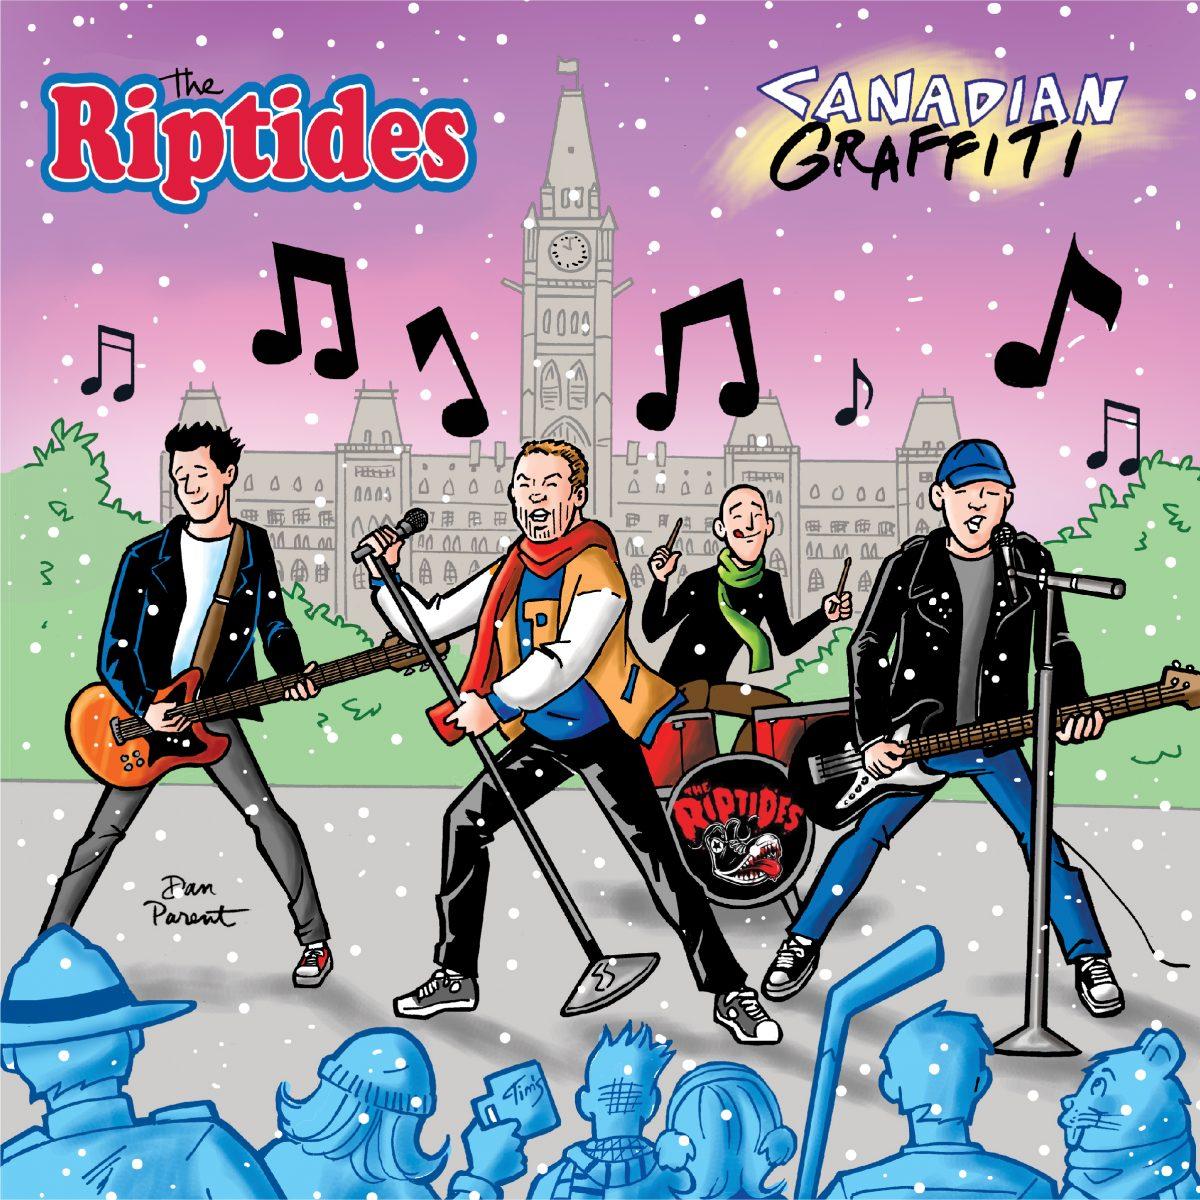 The Riptides – Canadian Graffiti (Vinyl)